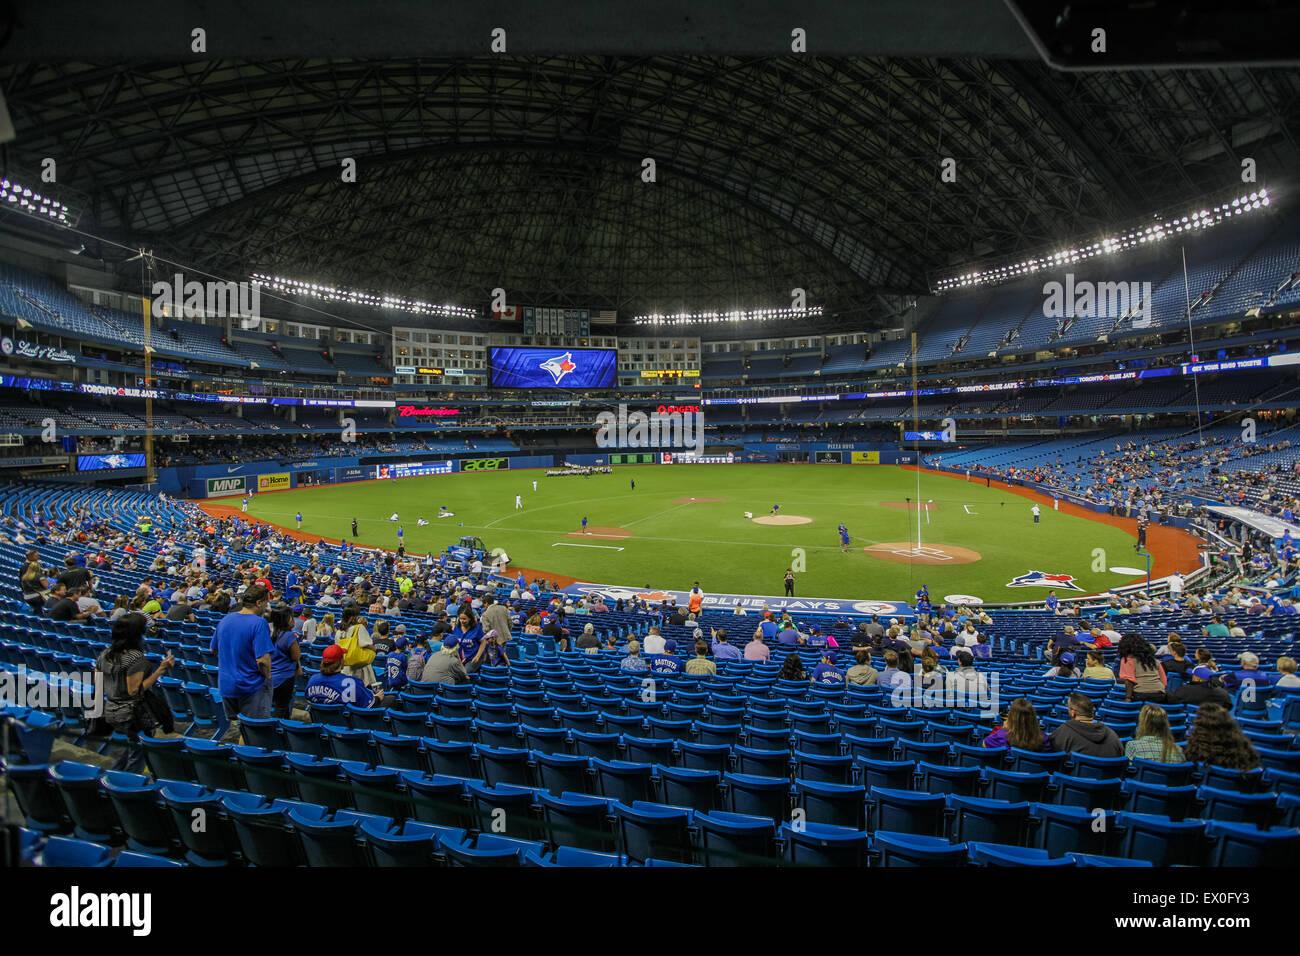 baseball game rogers centre interior - Stock Image